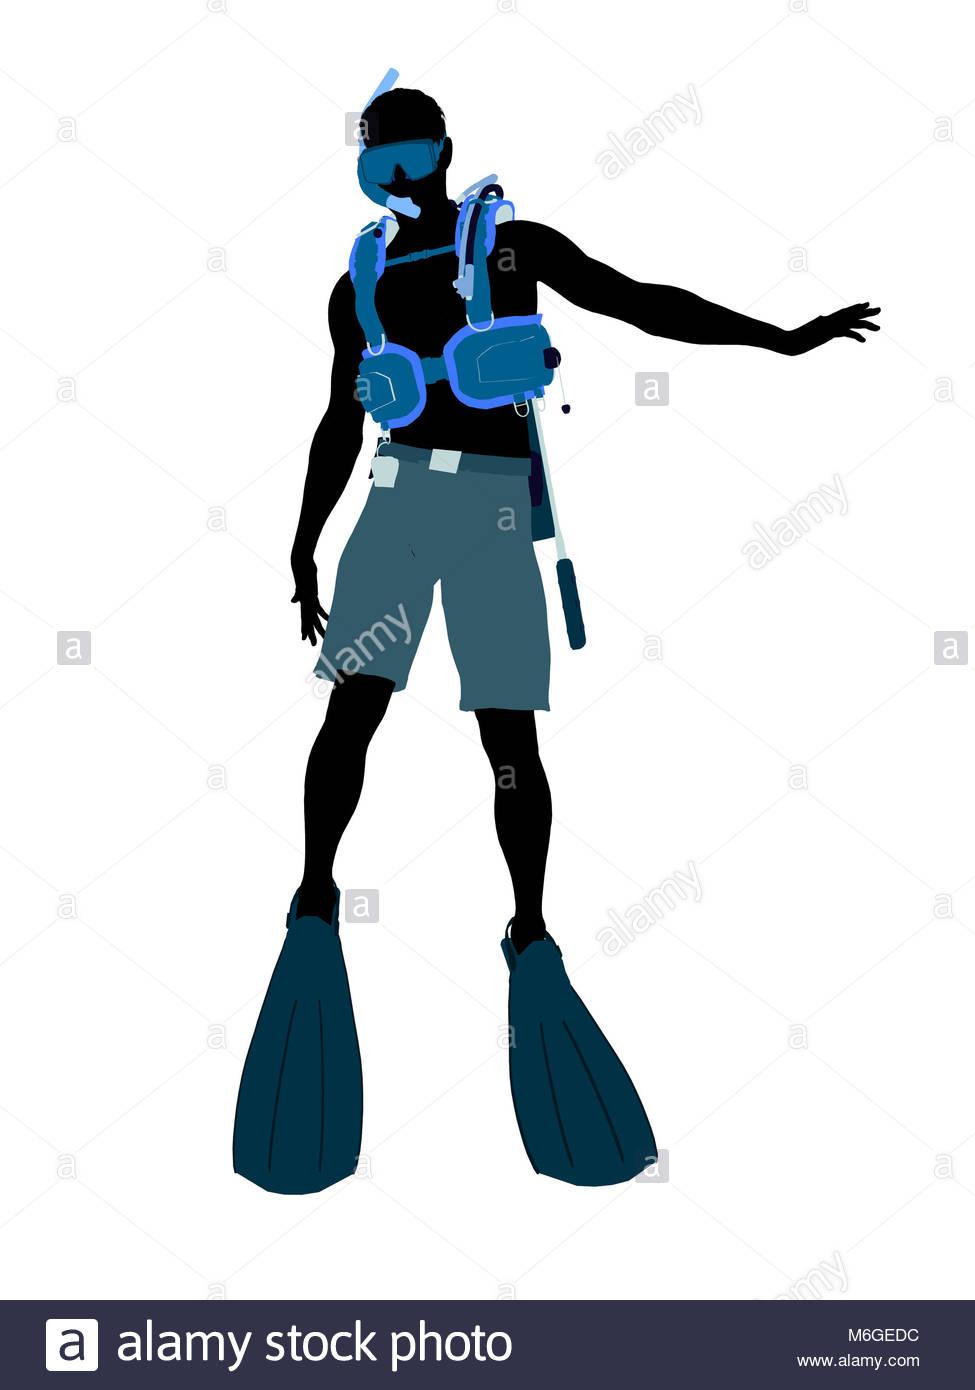 975x1390 Male Scuba Diver Art Illustration Silhouette On A White Background